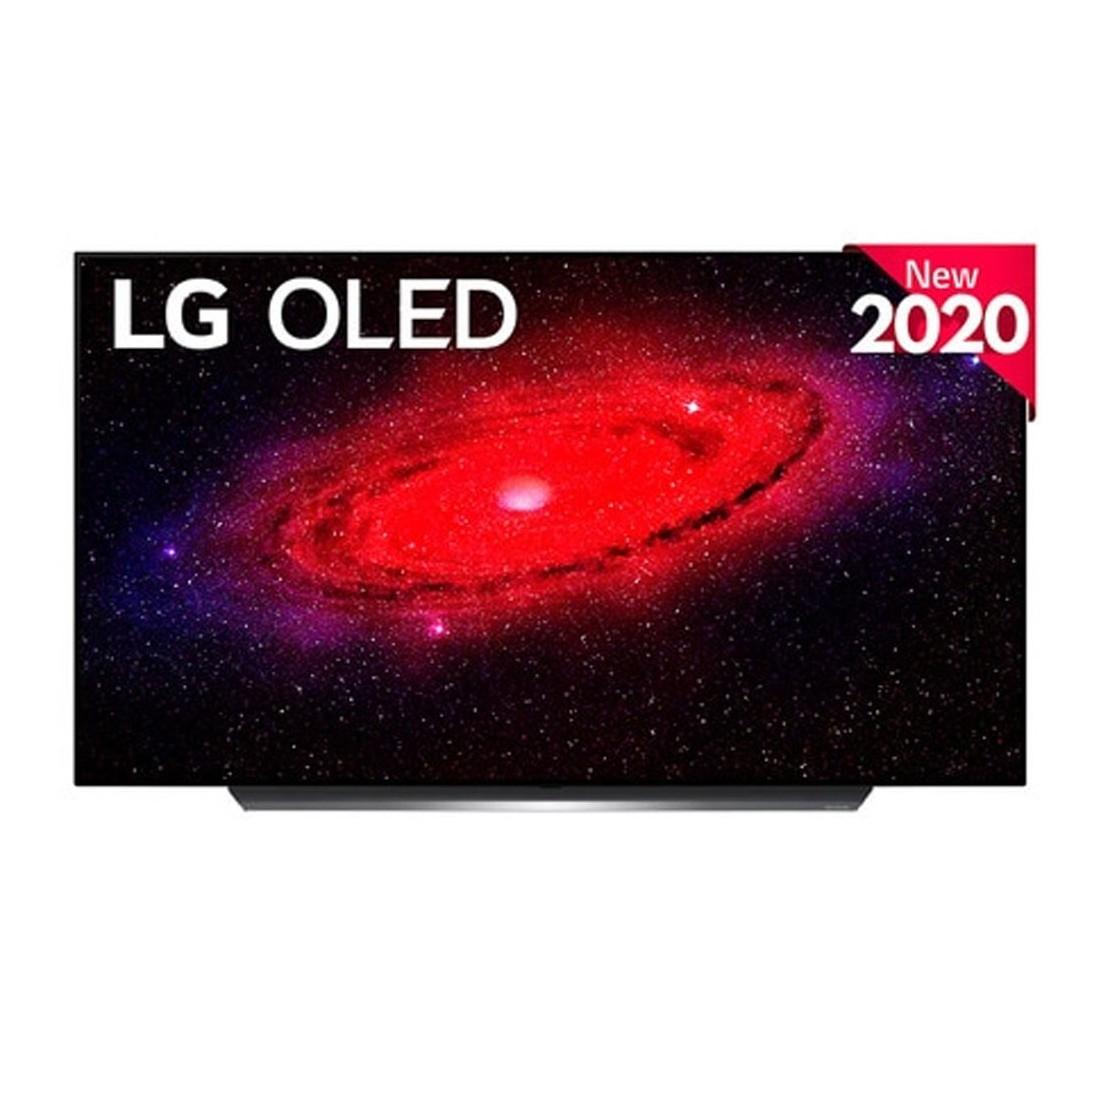 LG OLED48CX6LB. Envío gratis (1-7 Junio).